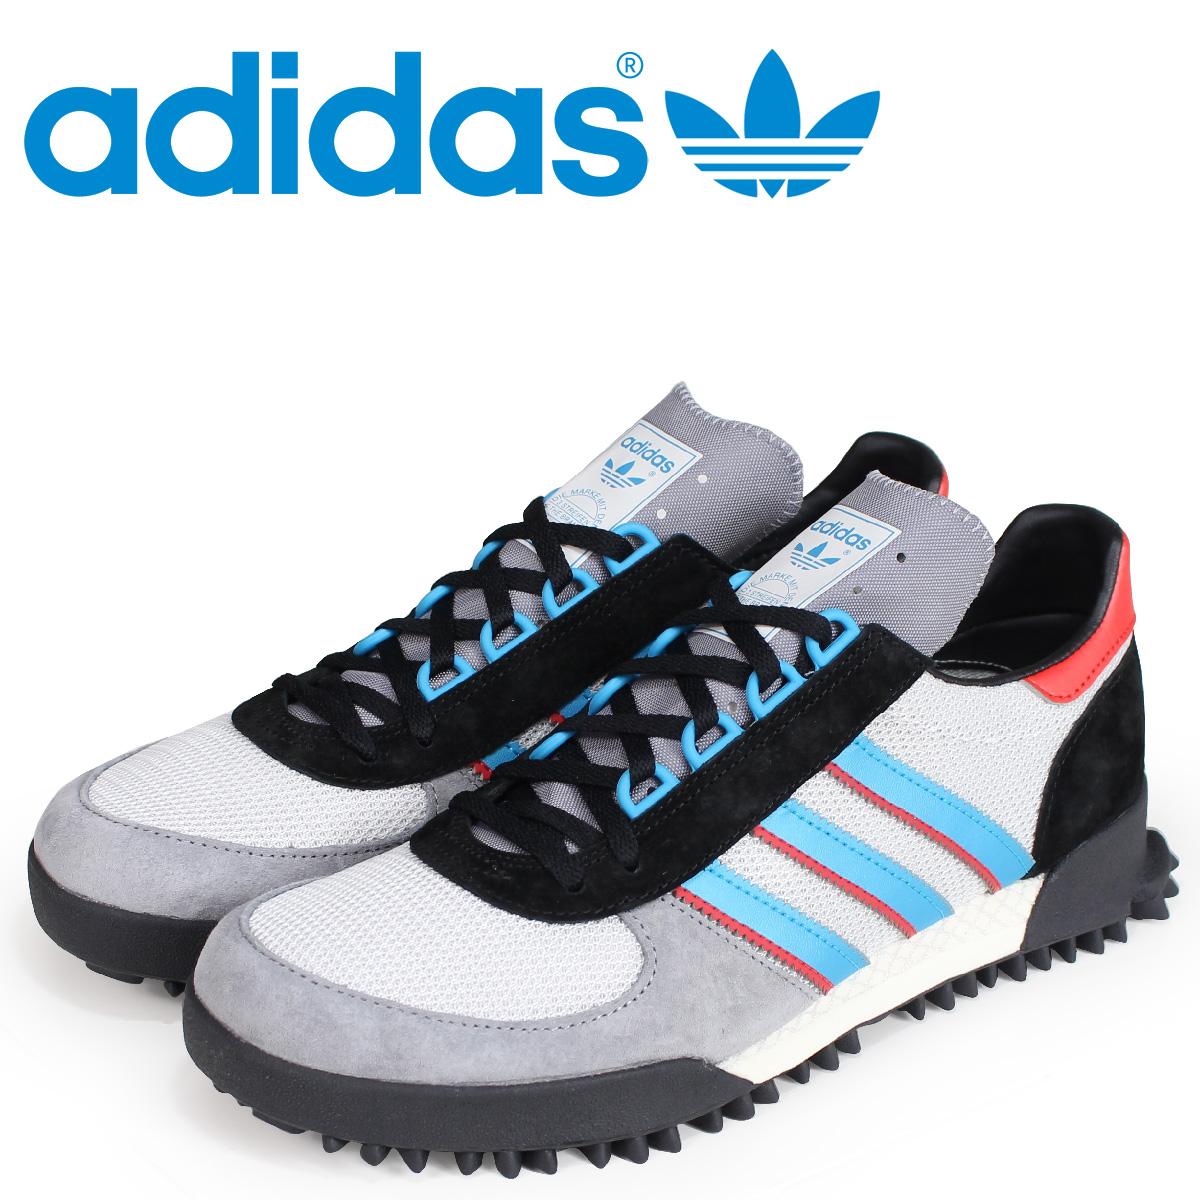 adidas Originals マラソン アディダス オリジナルス スニーカー MARATHON TR メンズ B28134 グレー